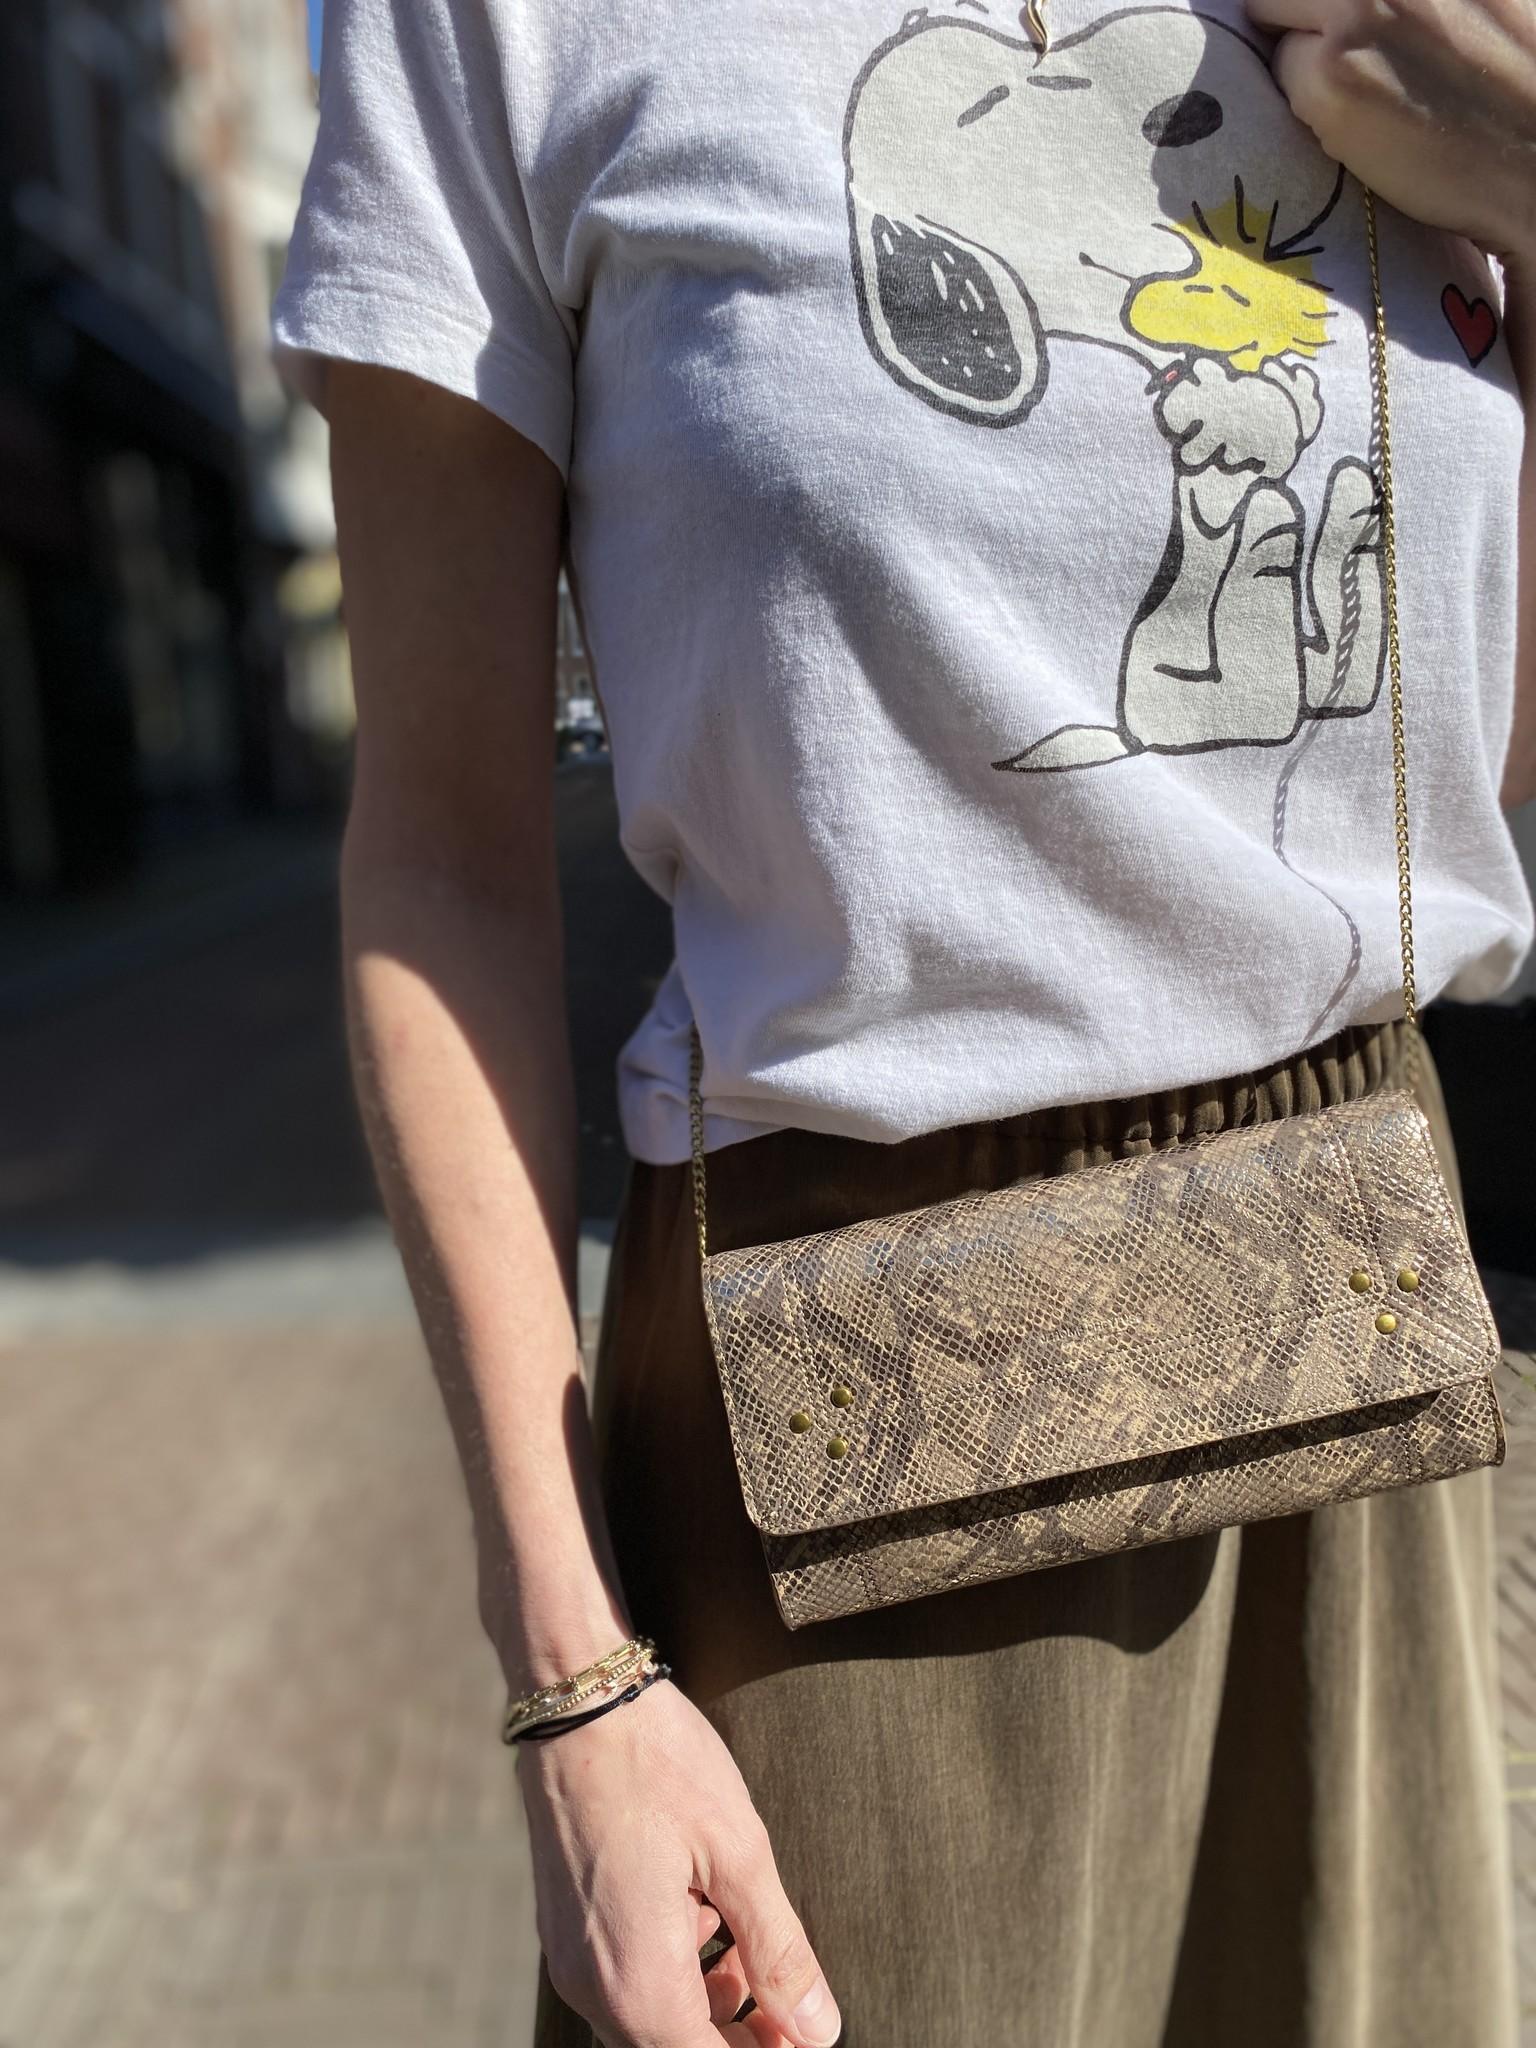 T-shirt Vintage Snoopy-2